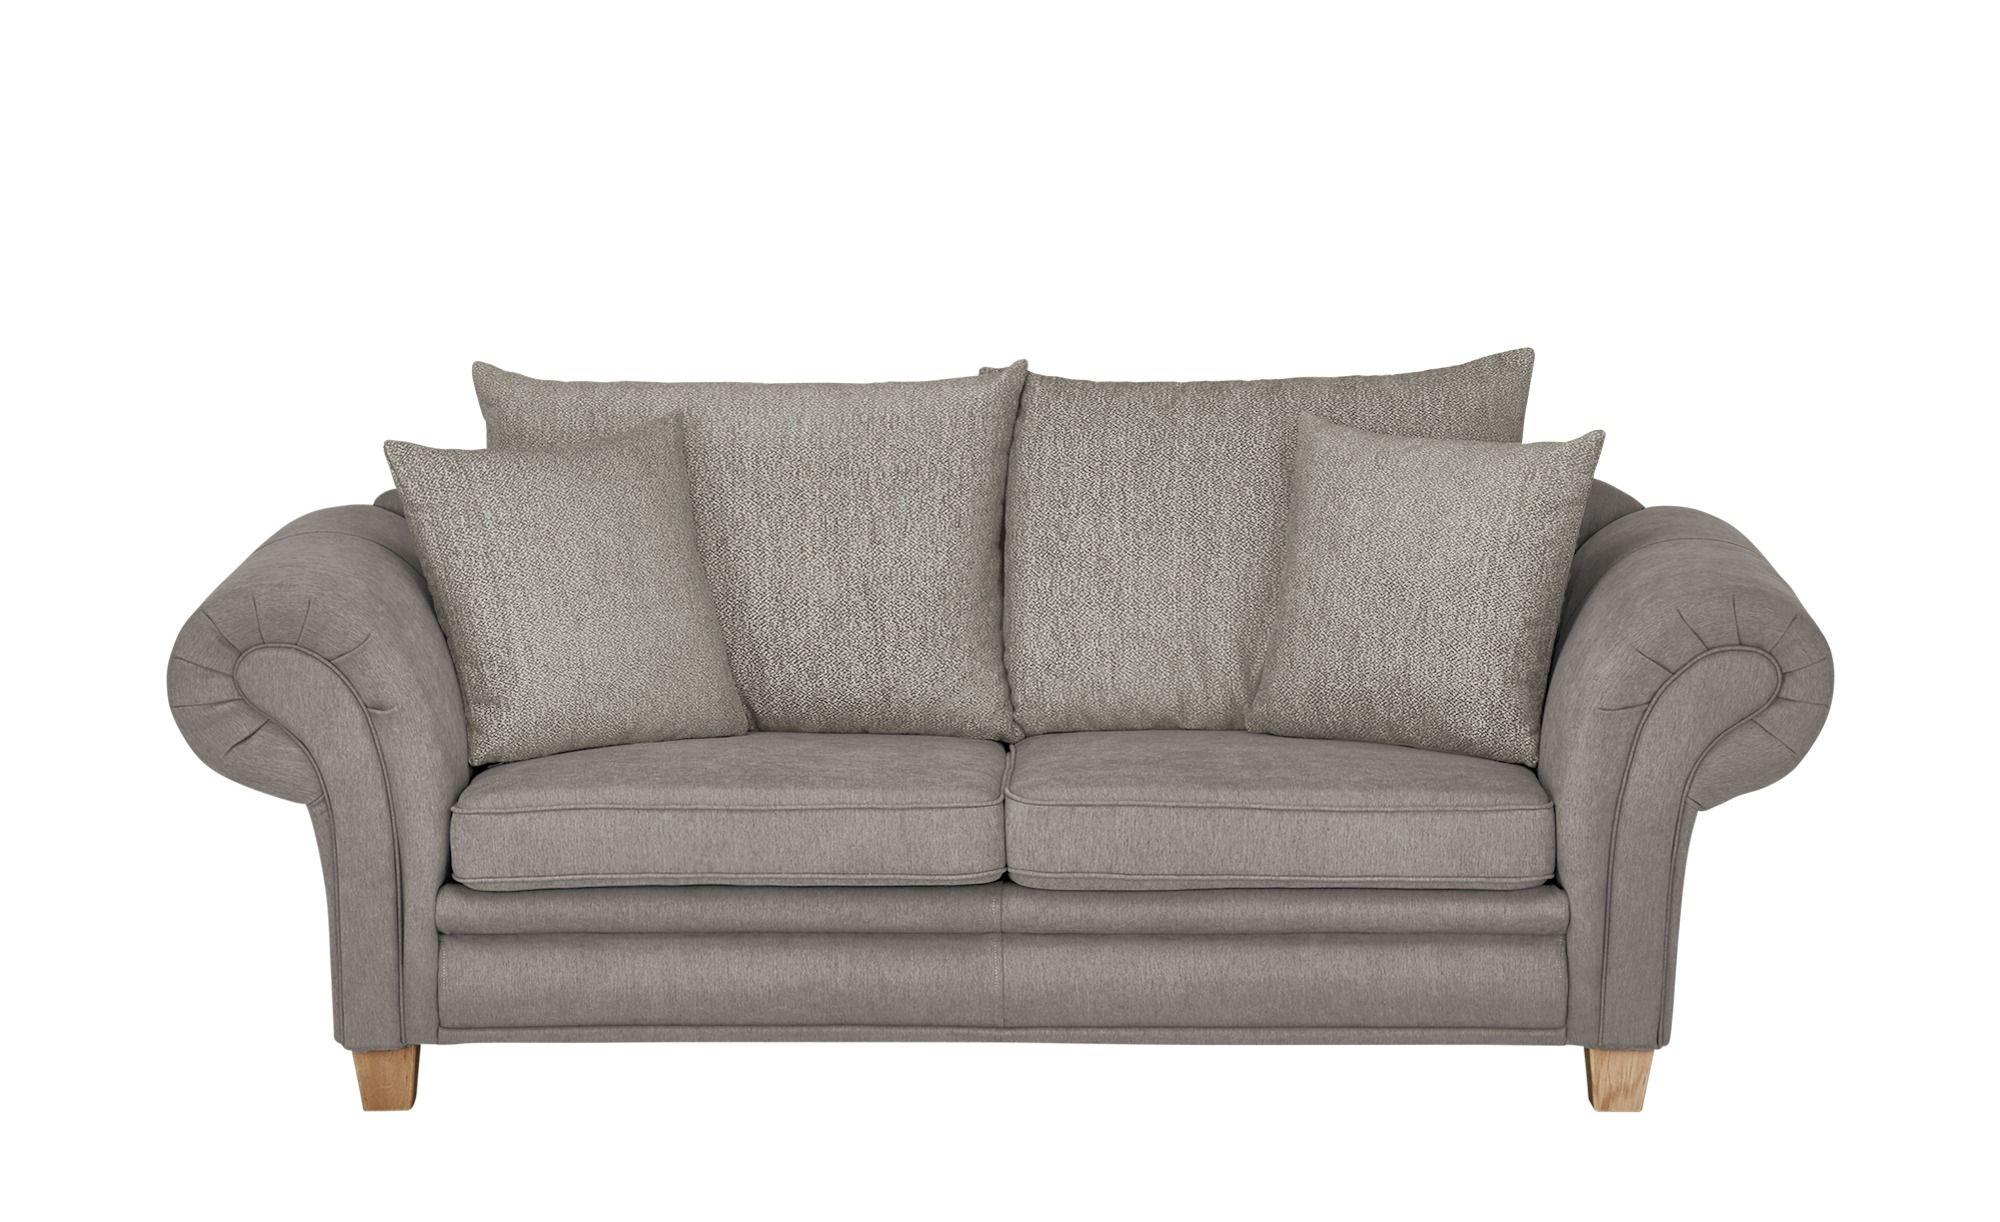 Big Sofa Gunstig Big Sofa Covers Luxus Leder Sofa Garnitur